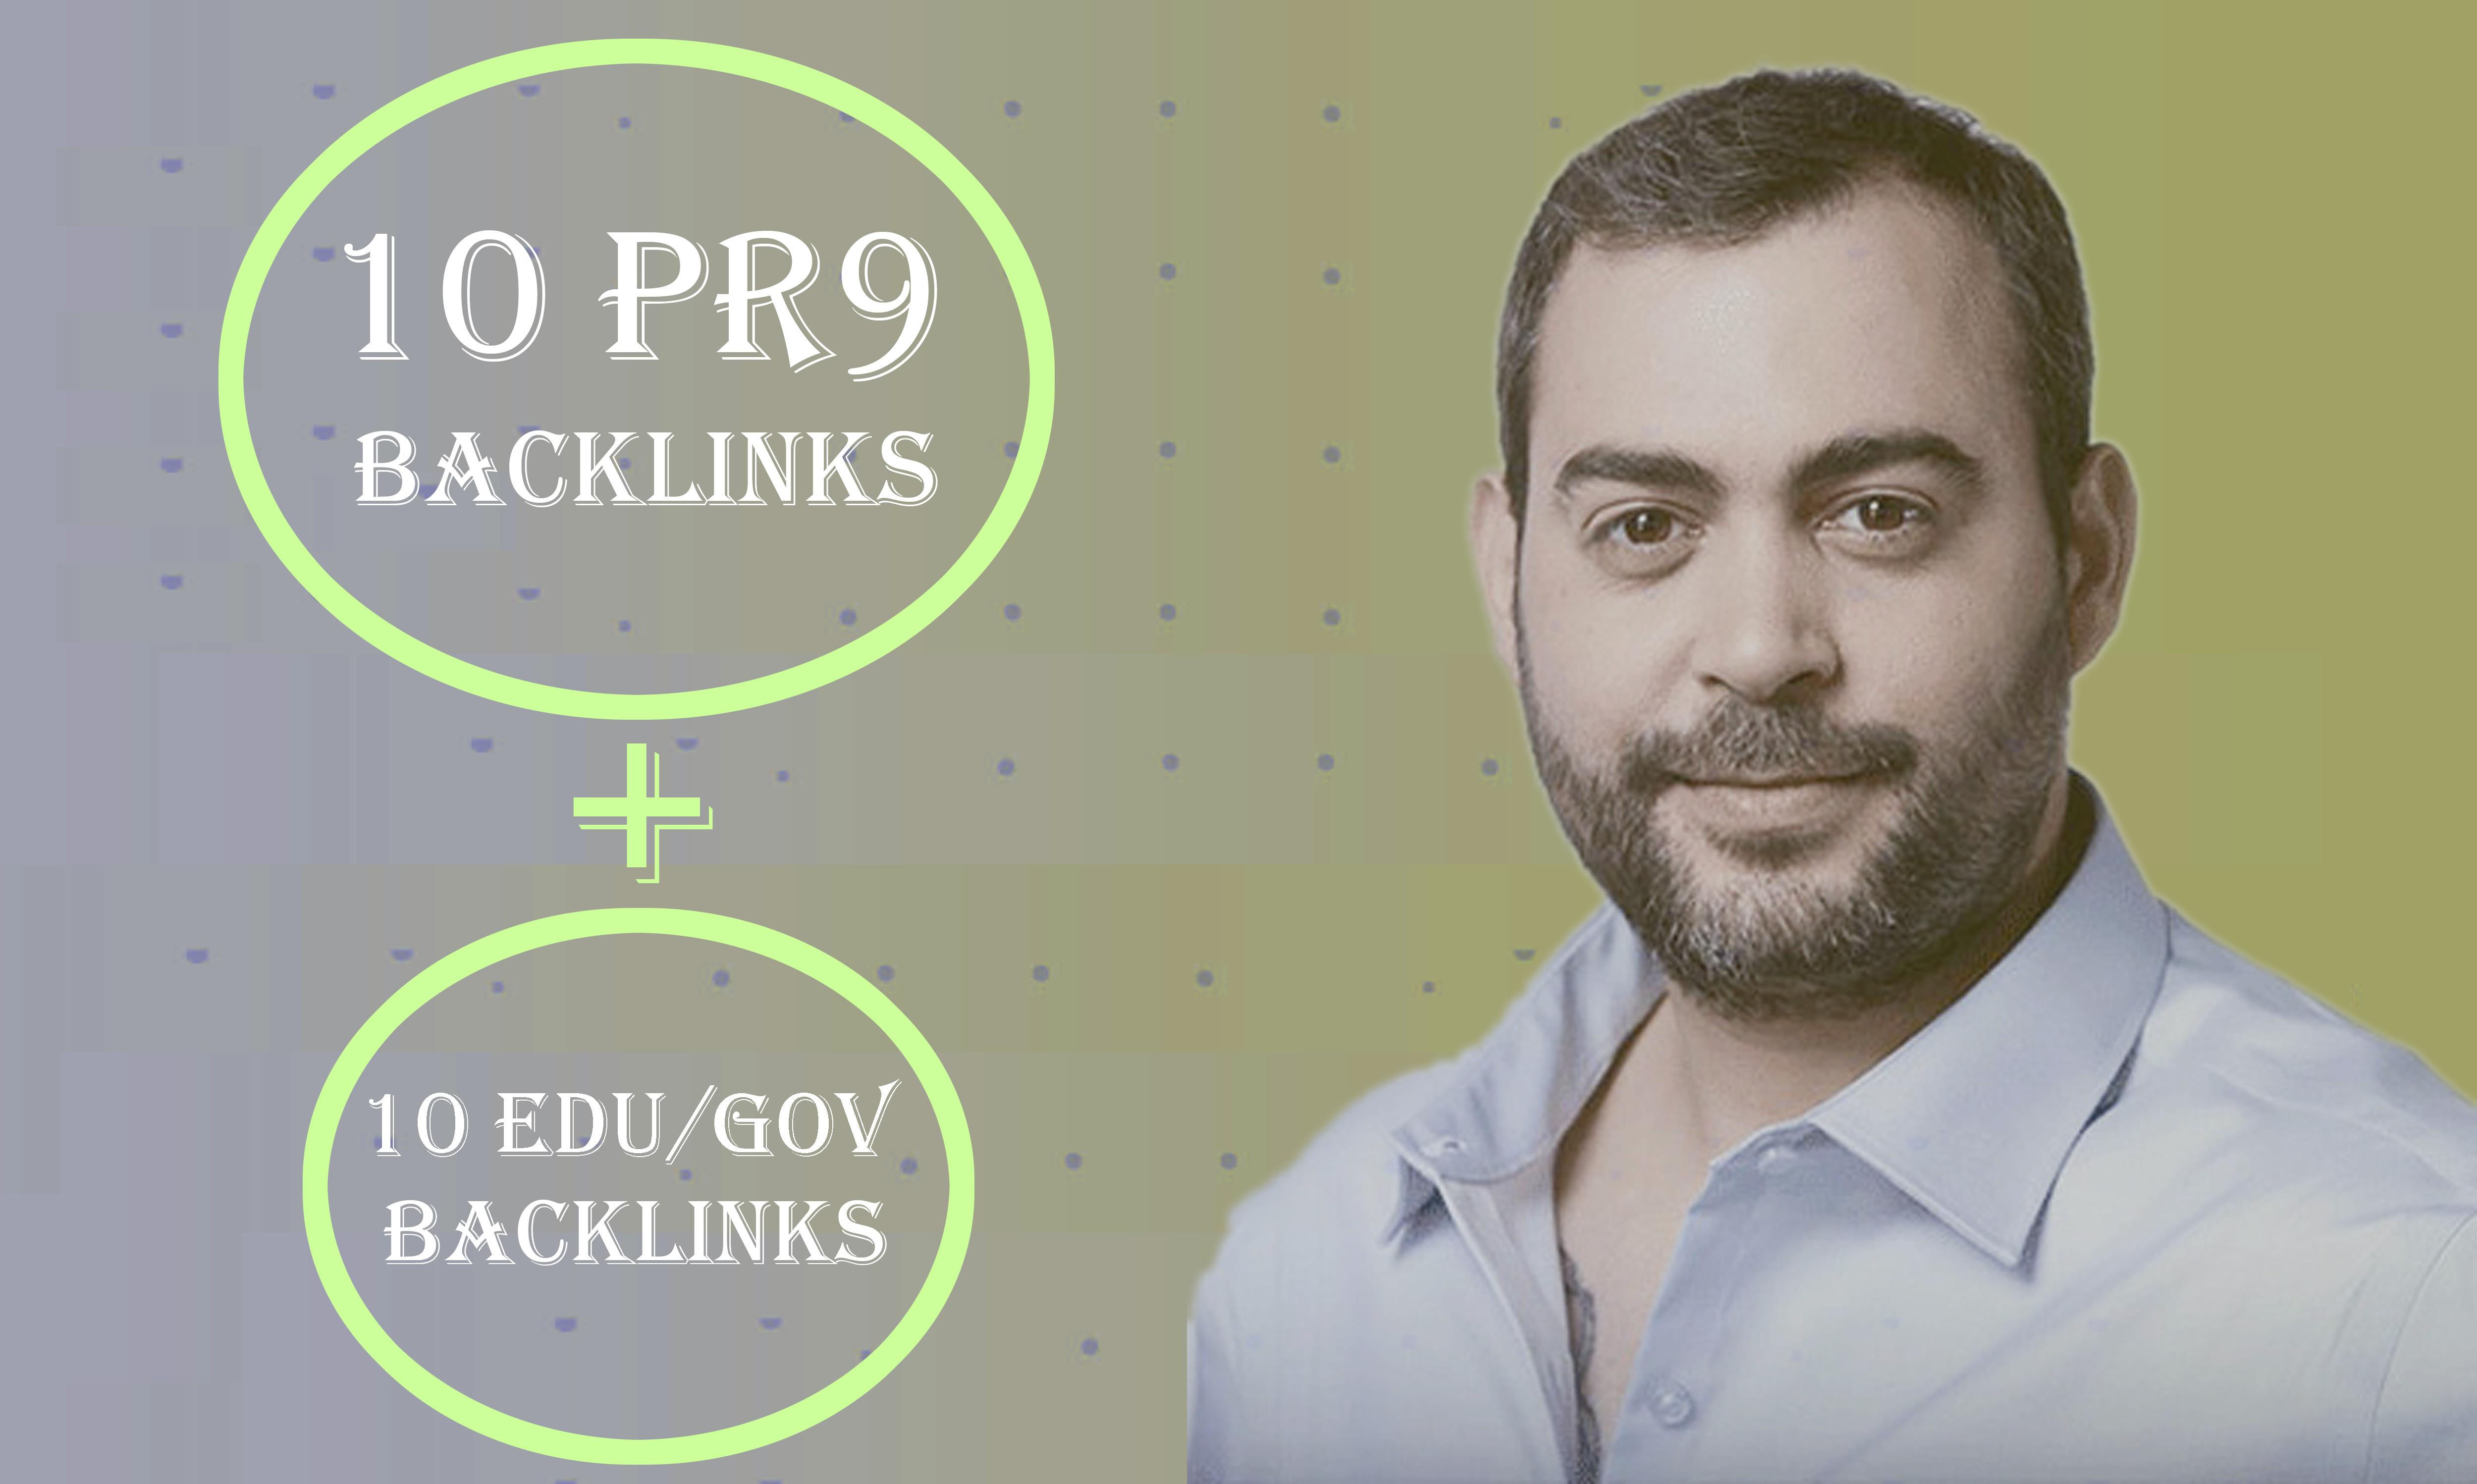 Manually Top 10 Pr9+10 EDU/GOV Safe SEO High Quality Profile Backlinks